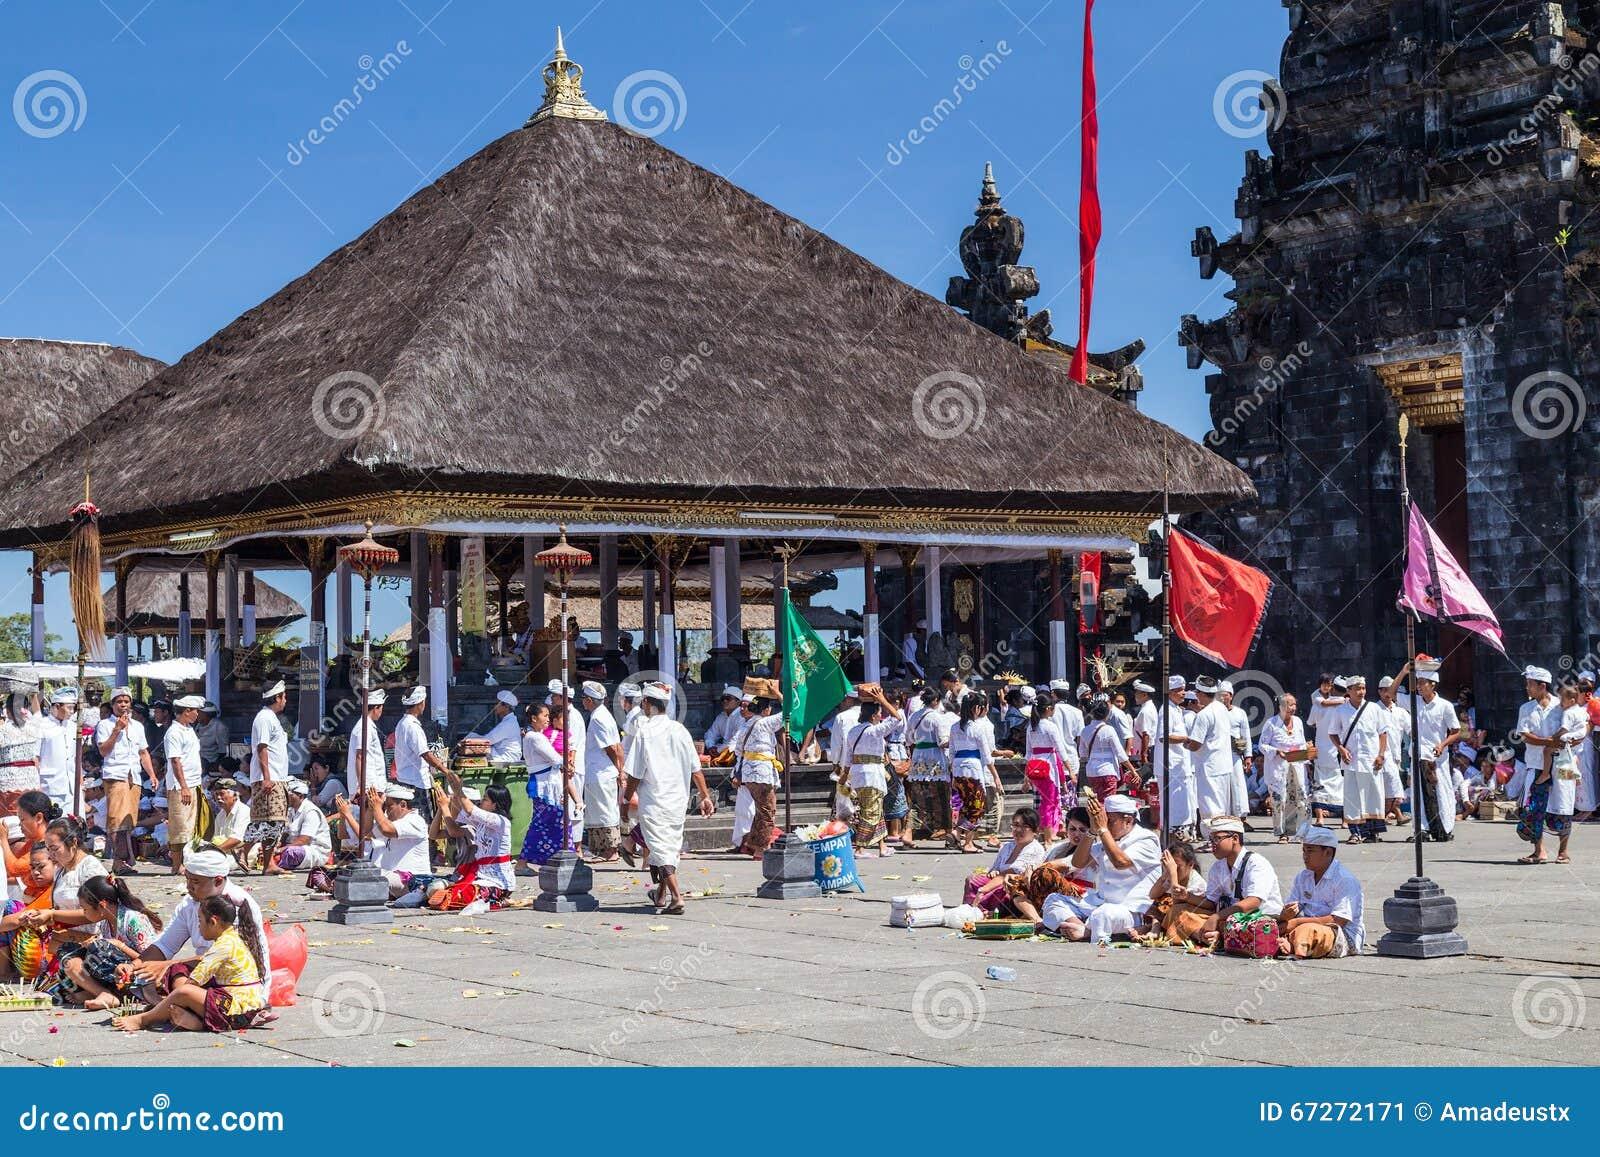 Village de Besakih, Bali/Indonésie - vers en octobre 2015 : Les gens priant dans le temple de Pura Besakih Balinese